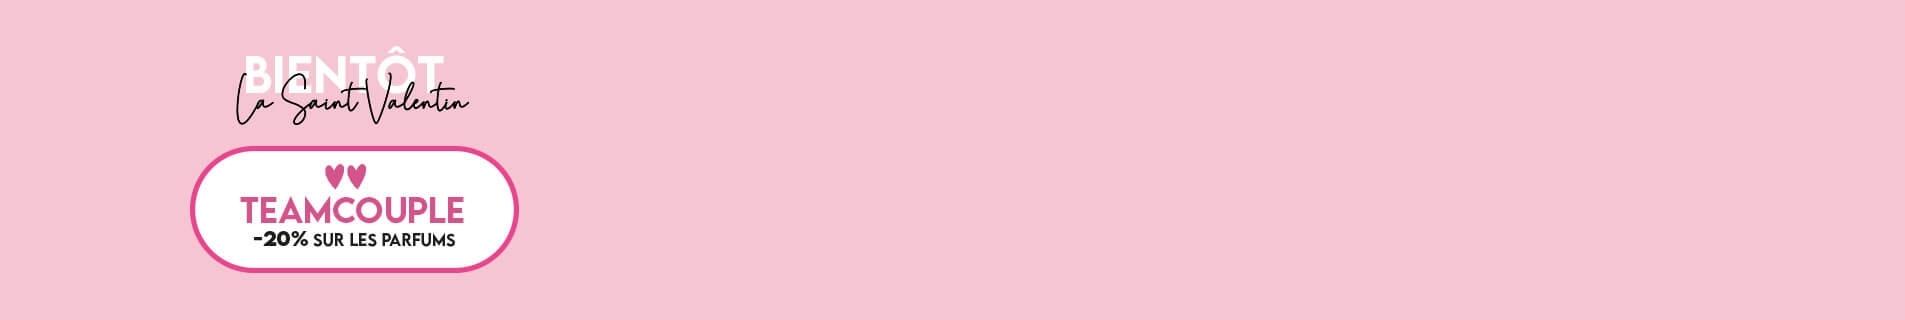 Maquillage coloré | Maquillage pas cher | SAGA Cosmetics